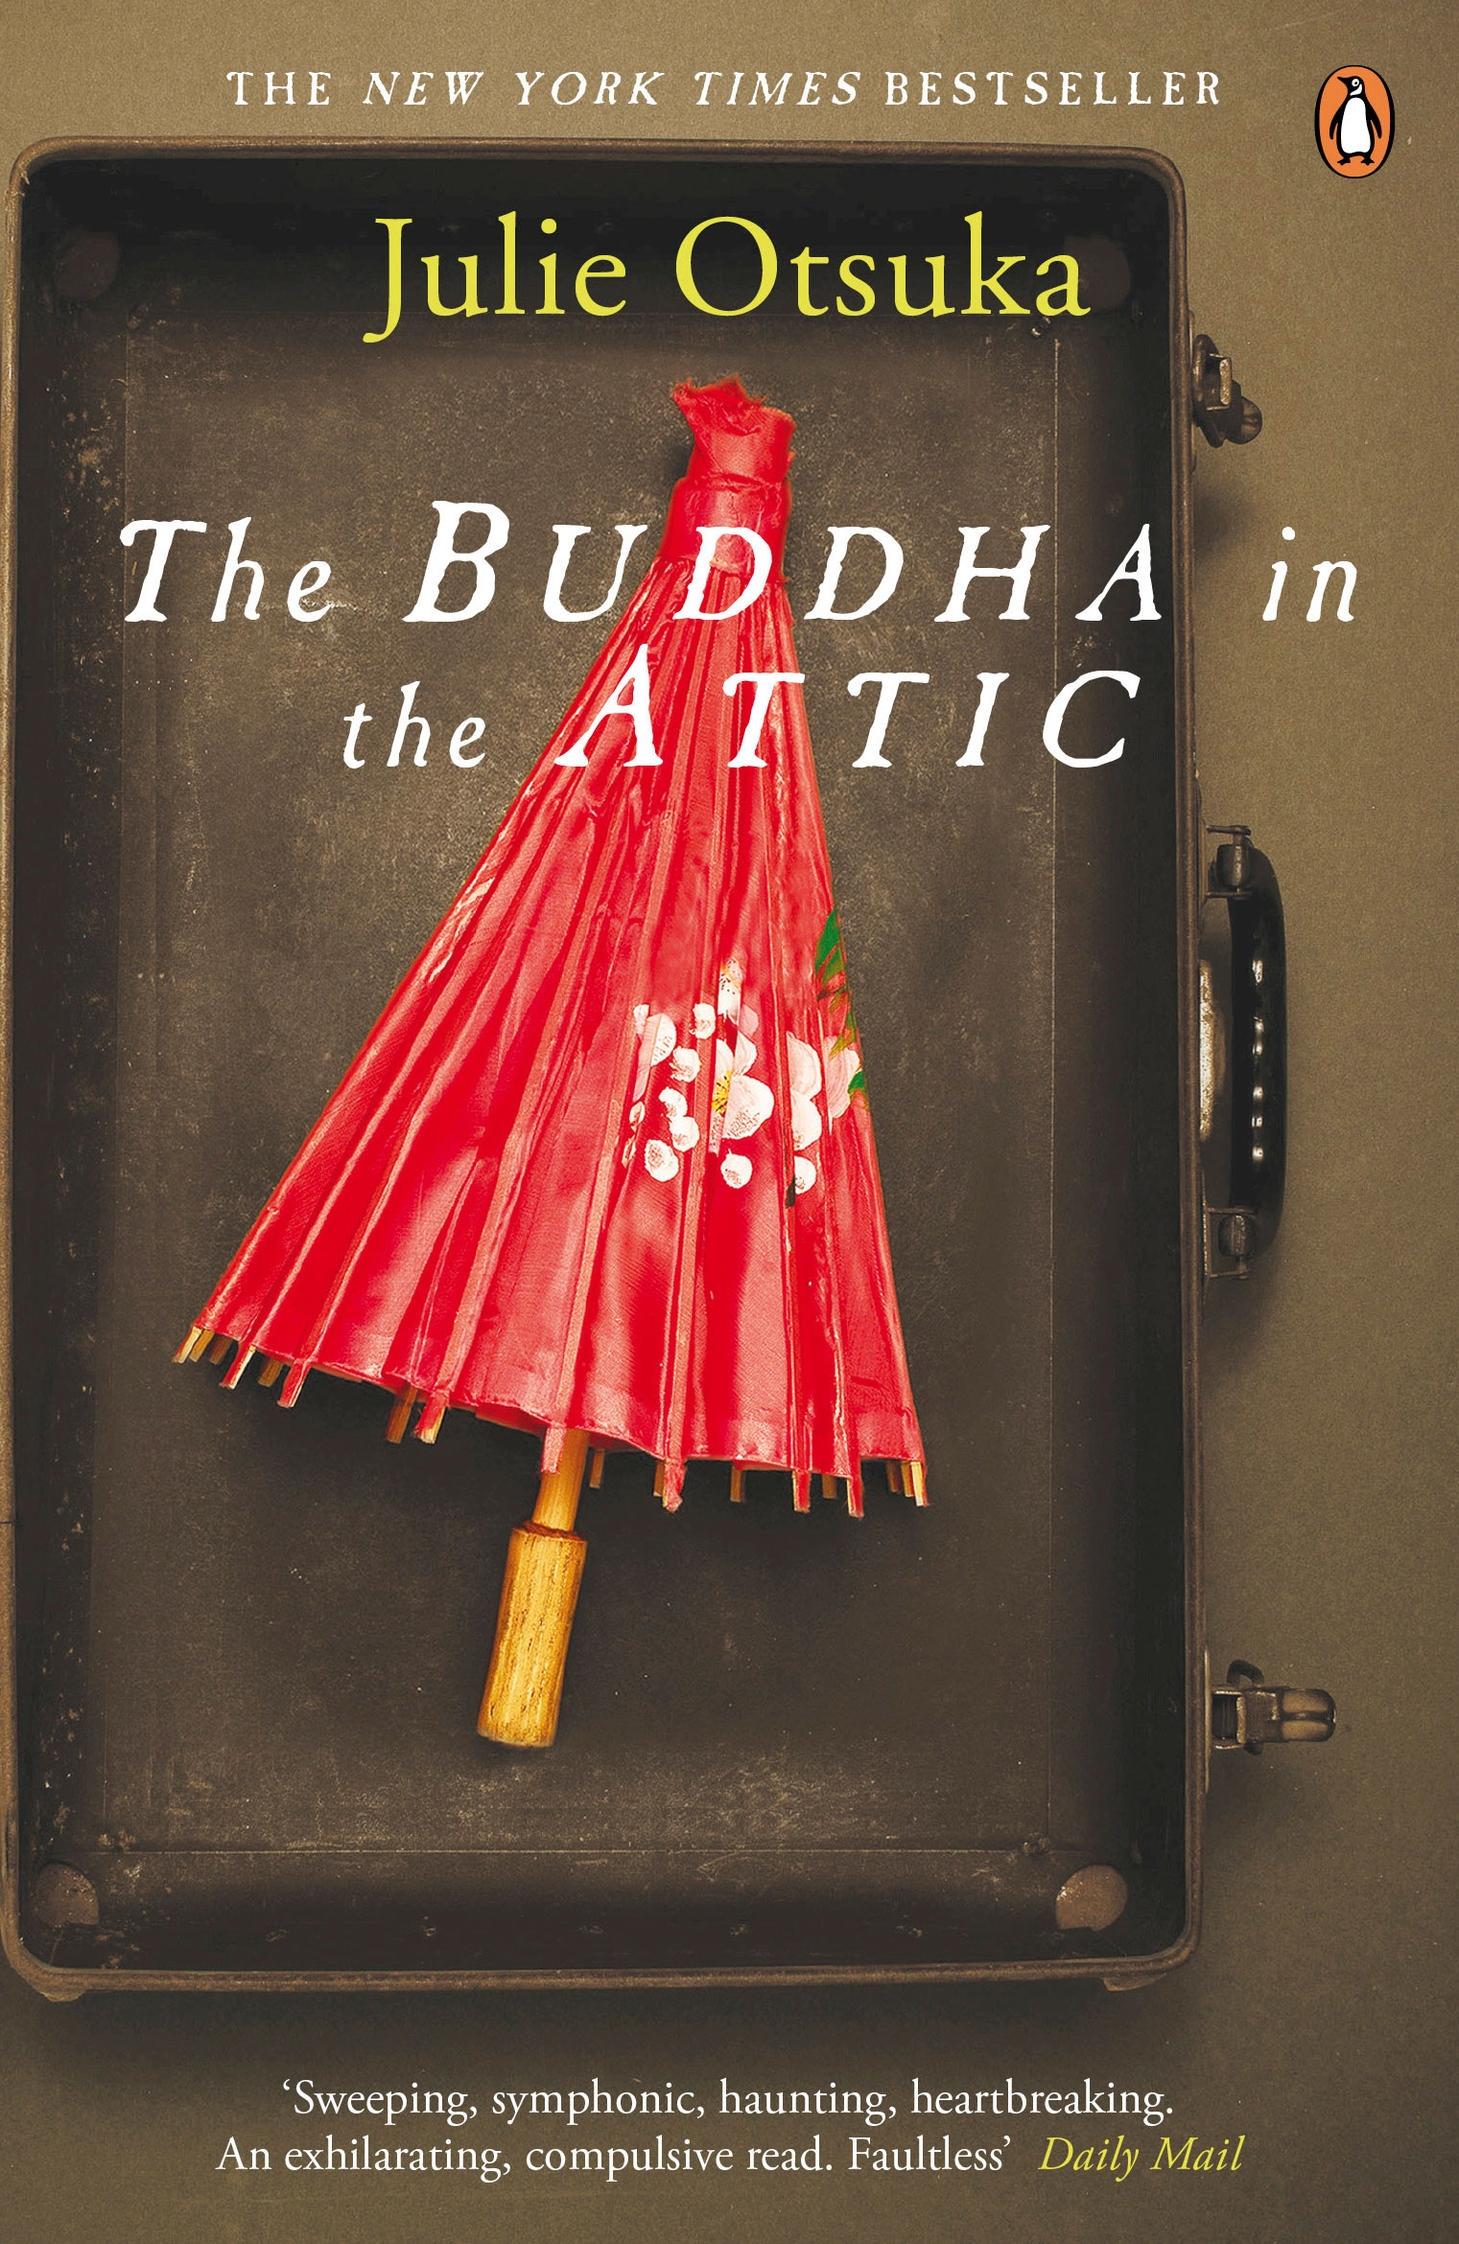 BUDDHA IN THE ATTIC, THE